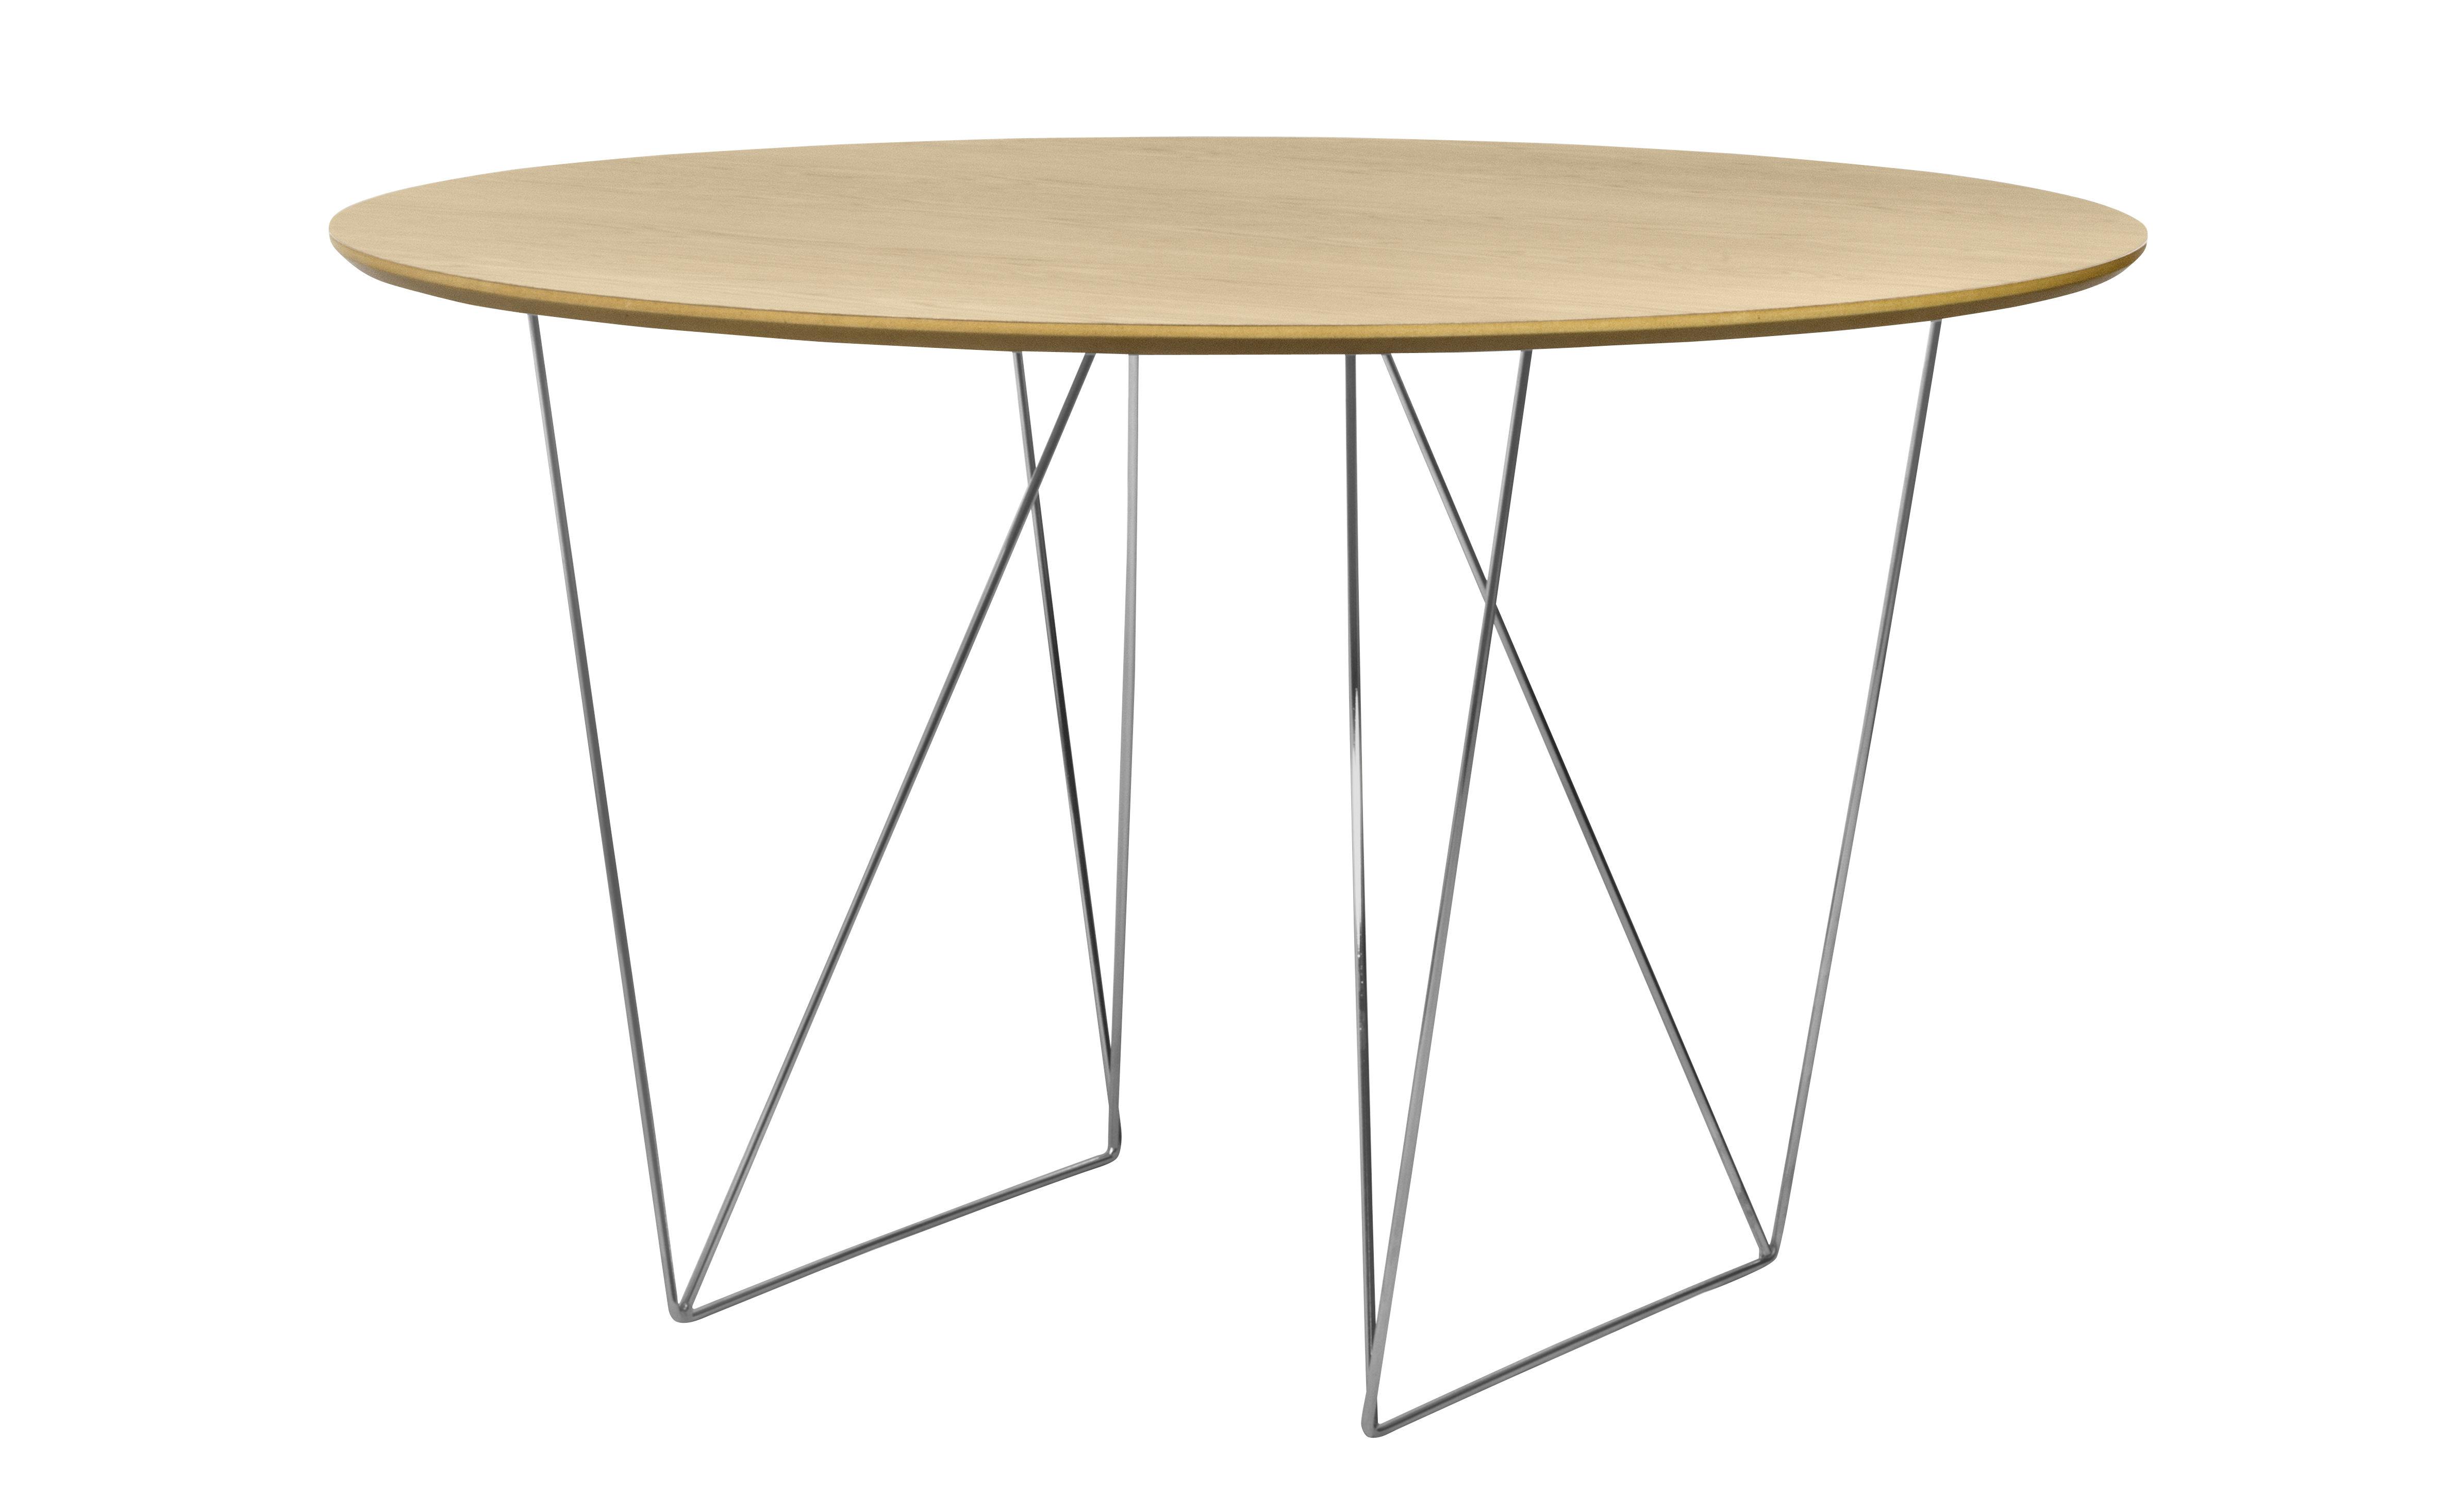 Trends - Dinner Time - Trestle Table - / Ø 120 cm by POP UP HOME - Oak / Chromed stand - Chromed metal, Honeycomb panels with oak veneer